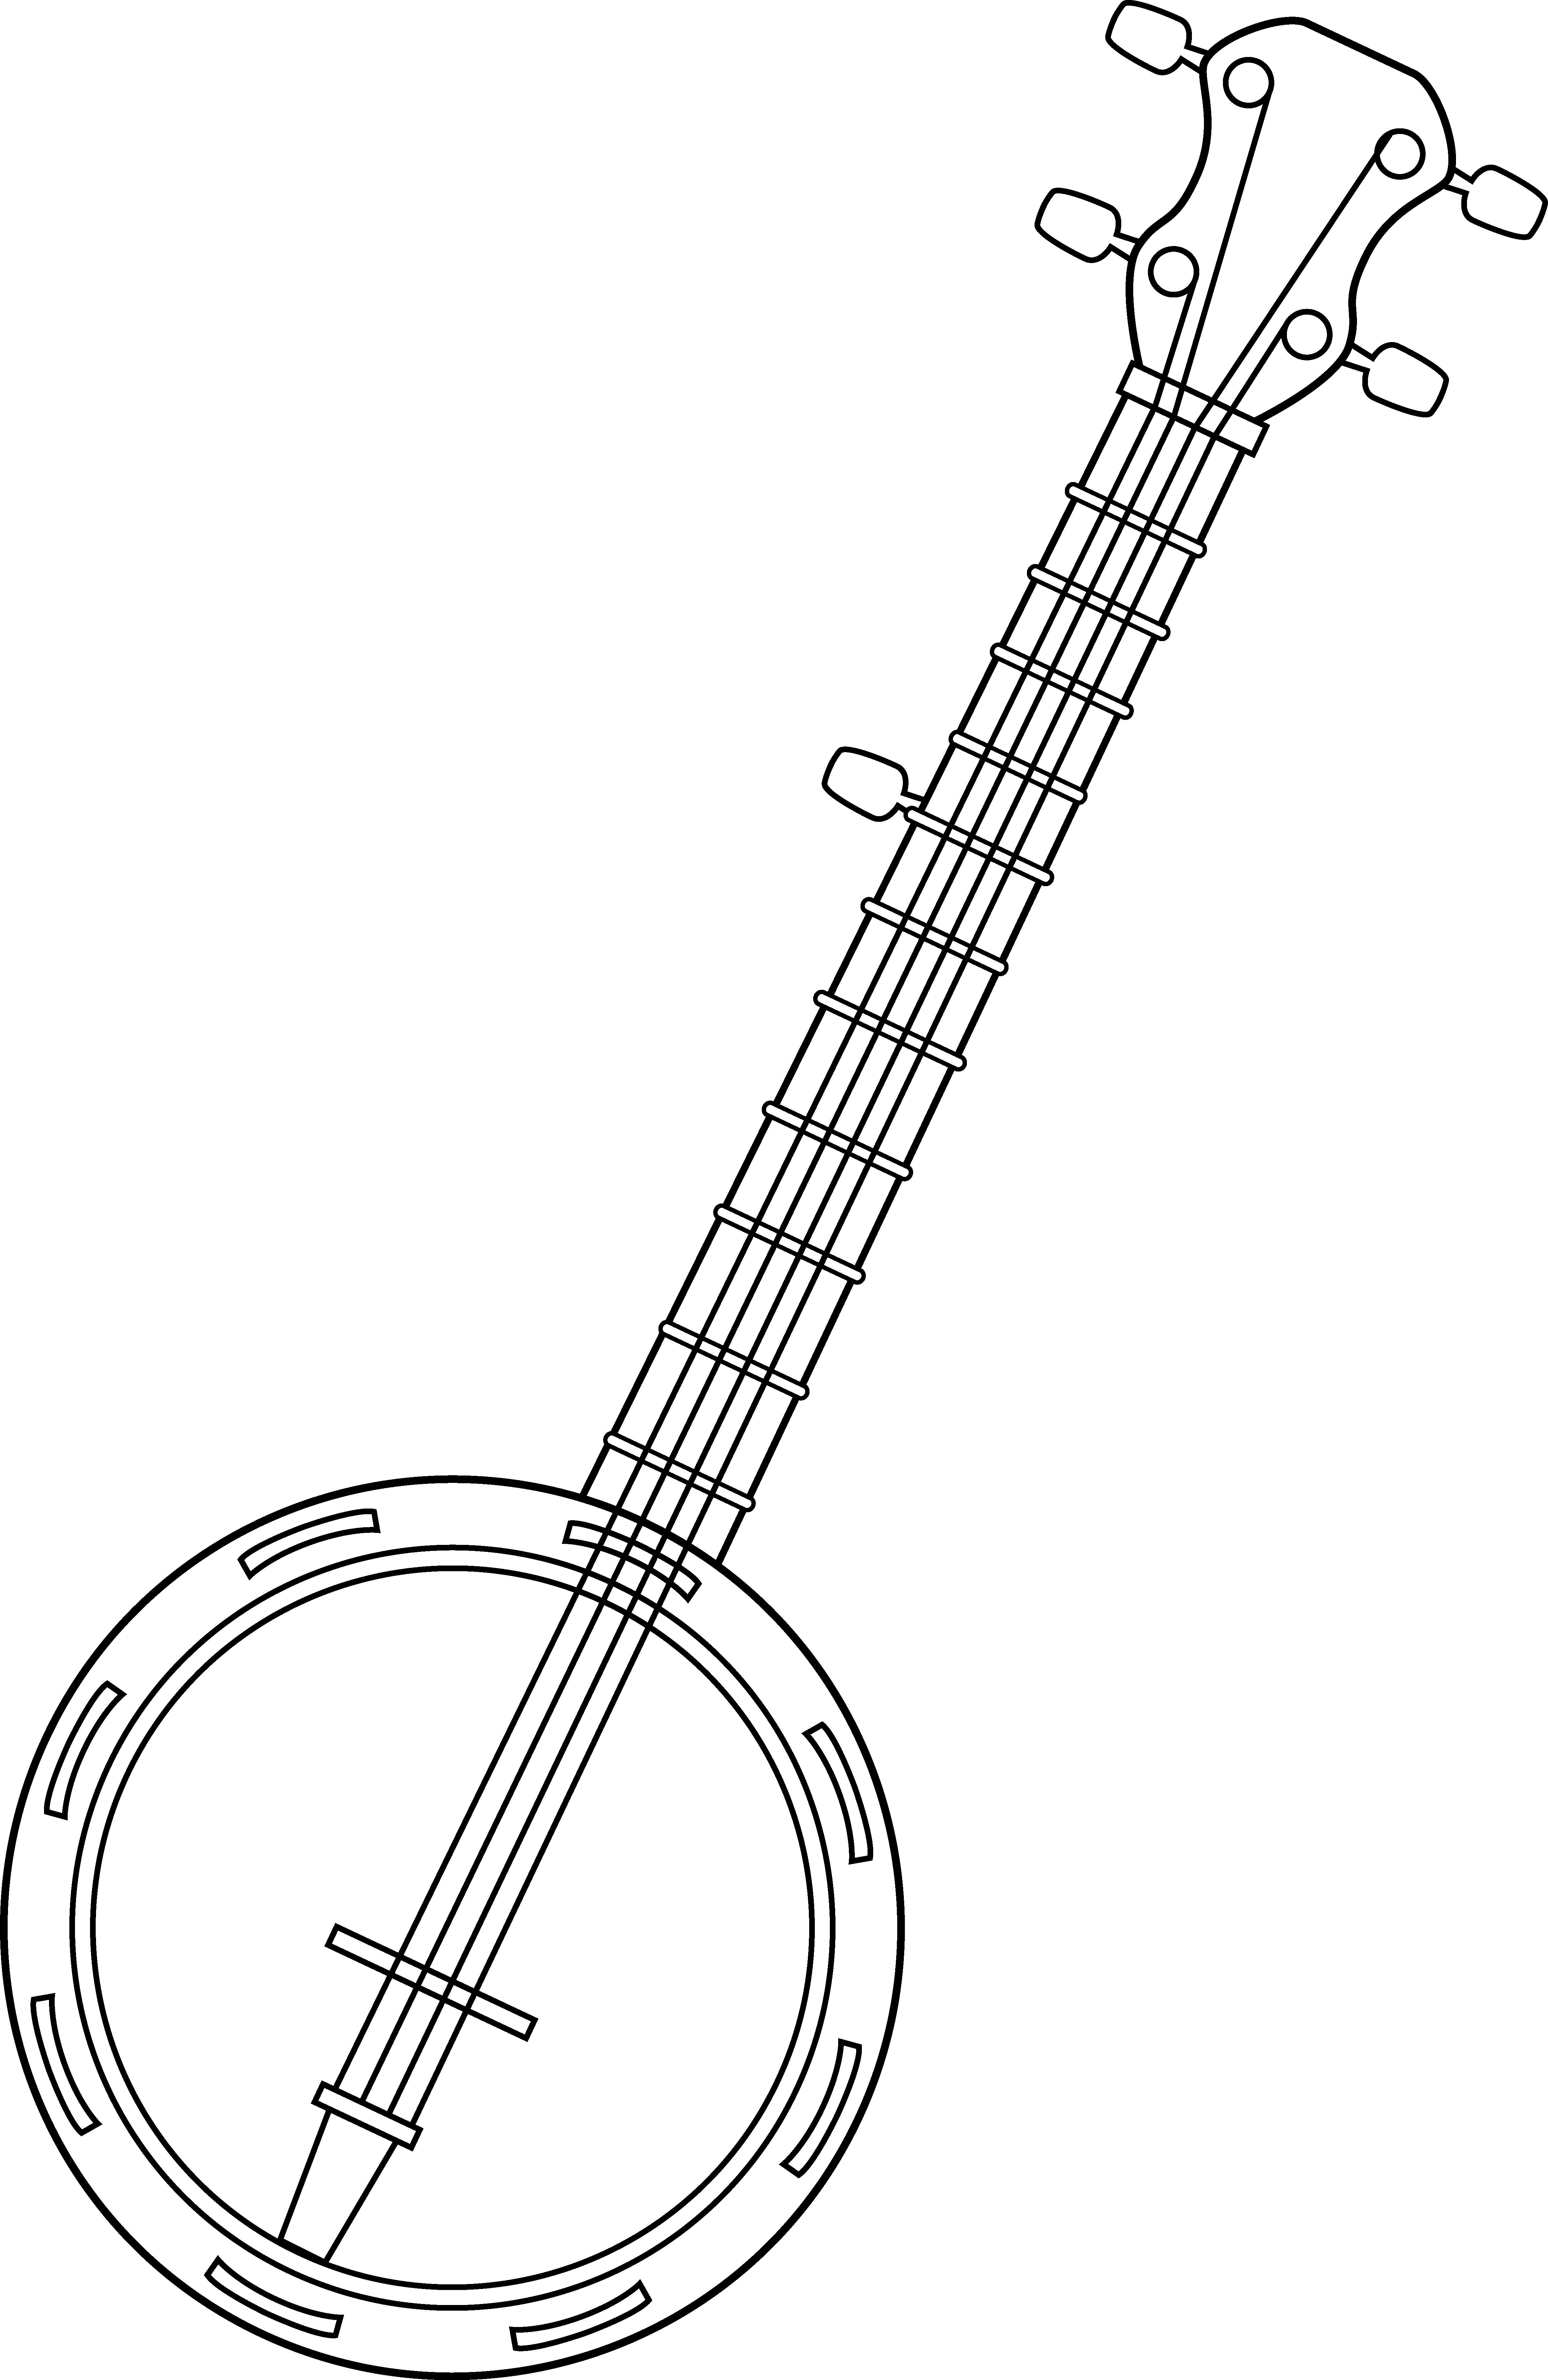 Banjo pictures clip art jpg free download Banjo Colorable Line Art - Free Clip Art jpg free download